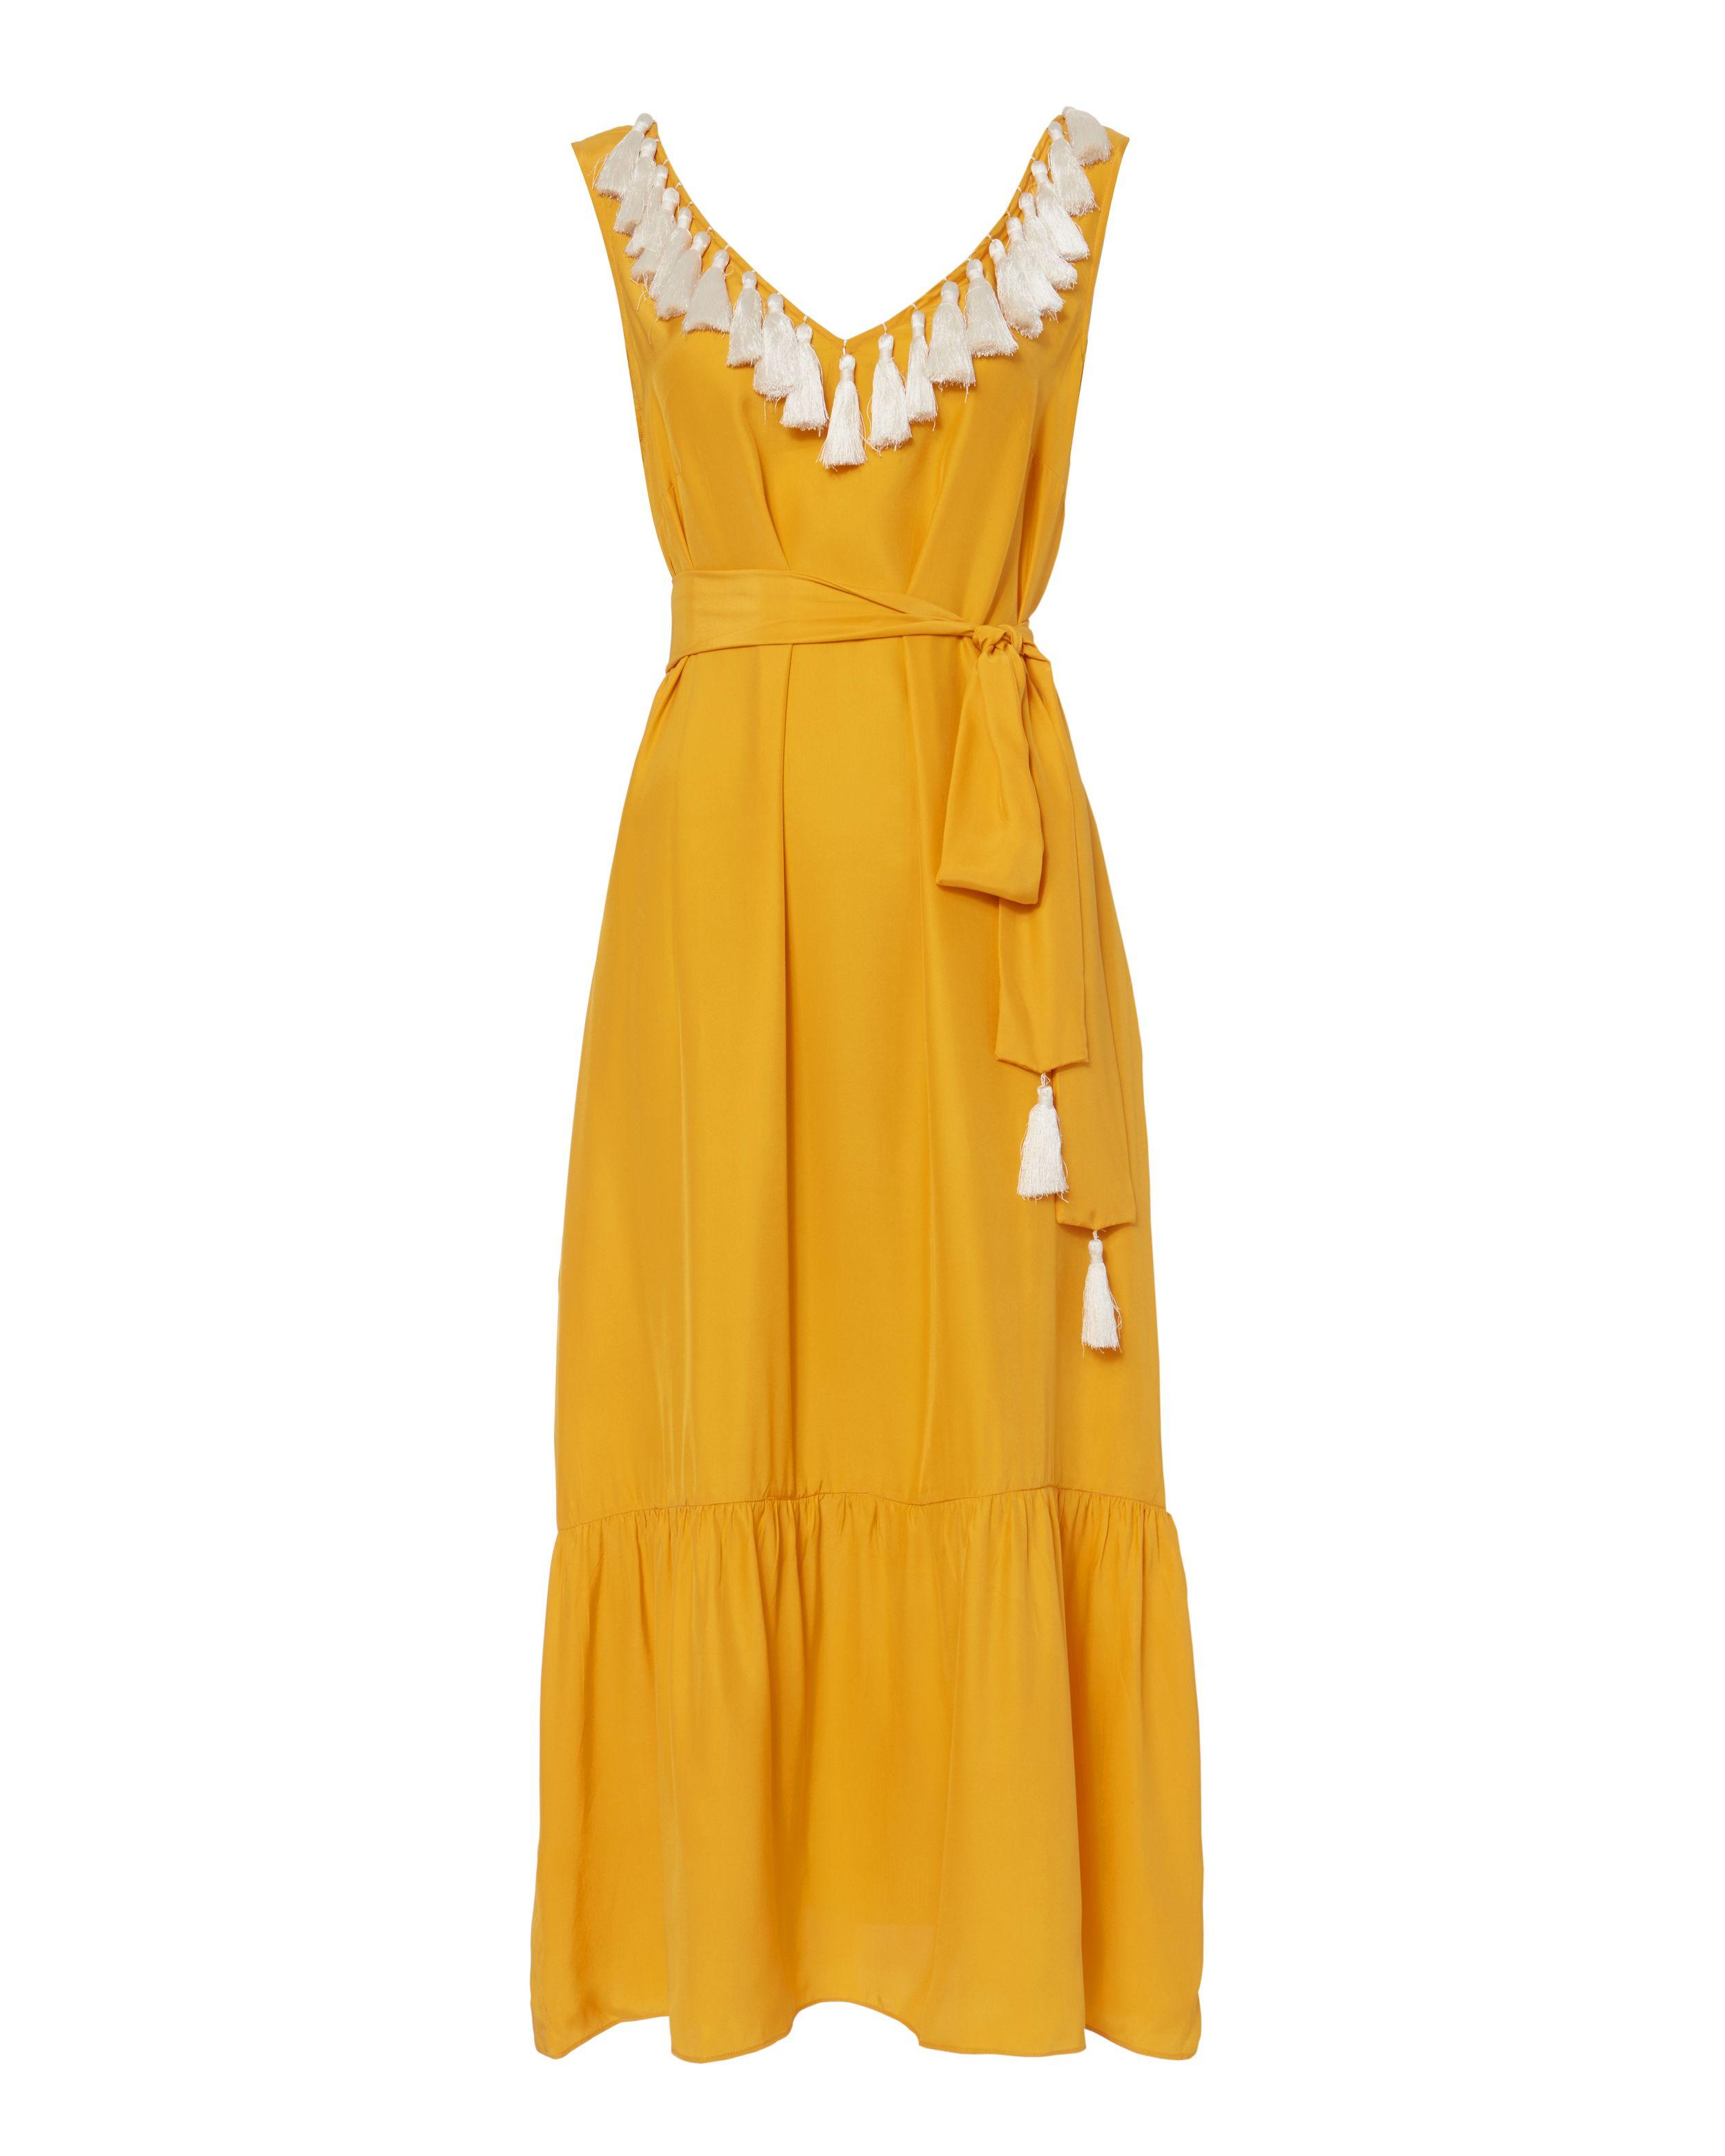 1ac4d7e222 Tasseled V-Neck Maxi Dress | Fashion x Pom Poms & Tassels in 2019 ...